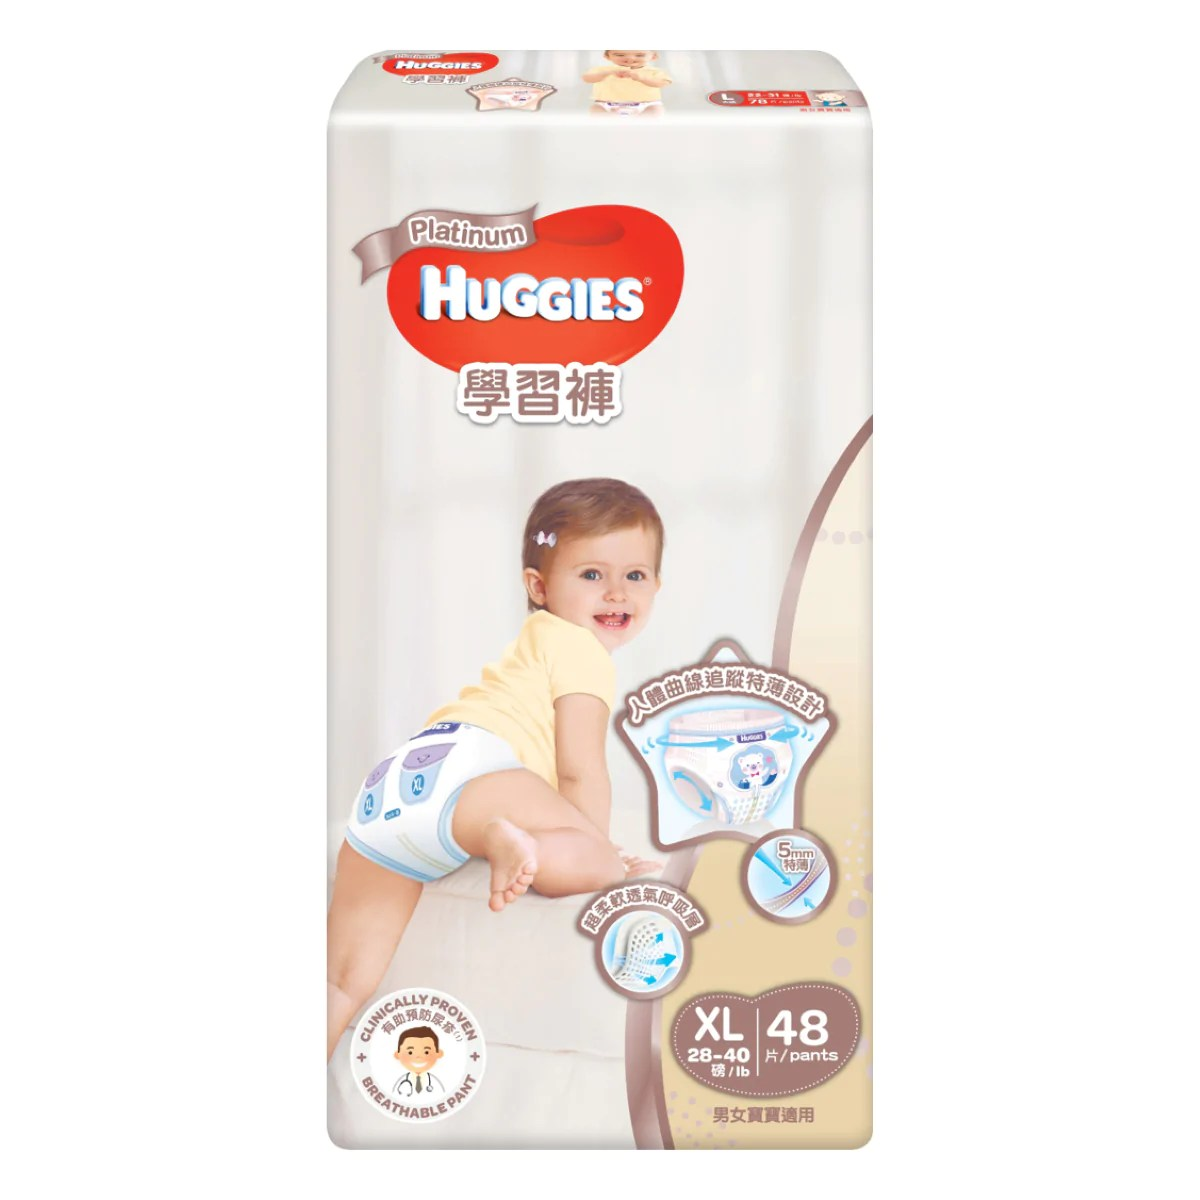 Huggies   鉑金裝學習褲加大碼   百保健與美網購 – 百保 BuyBo